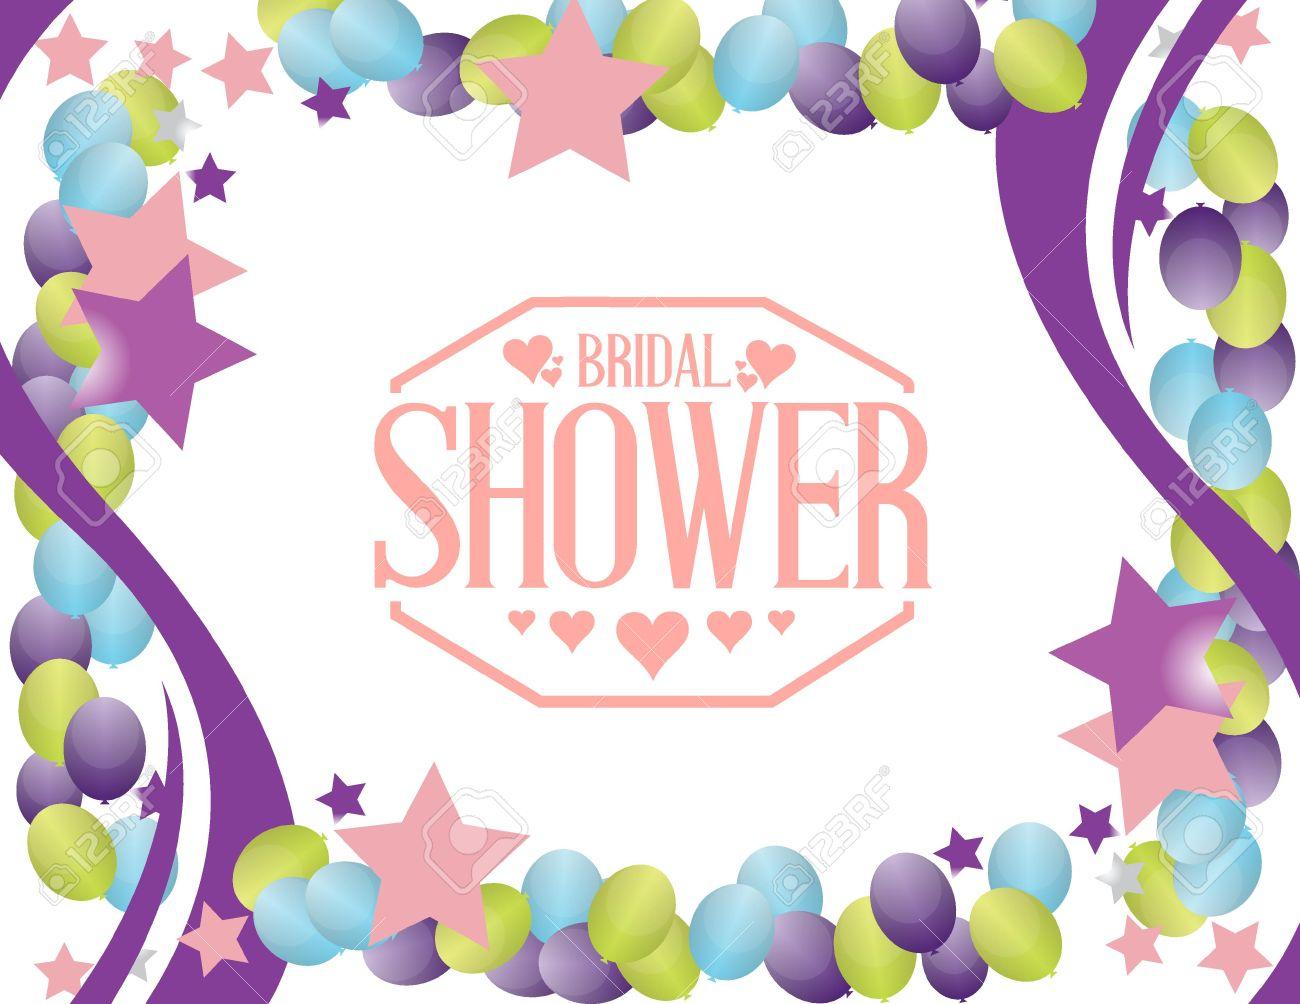 Bridal Shower Party Sign Background Illustration Design Graphic.